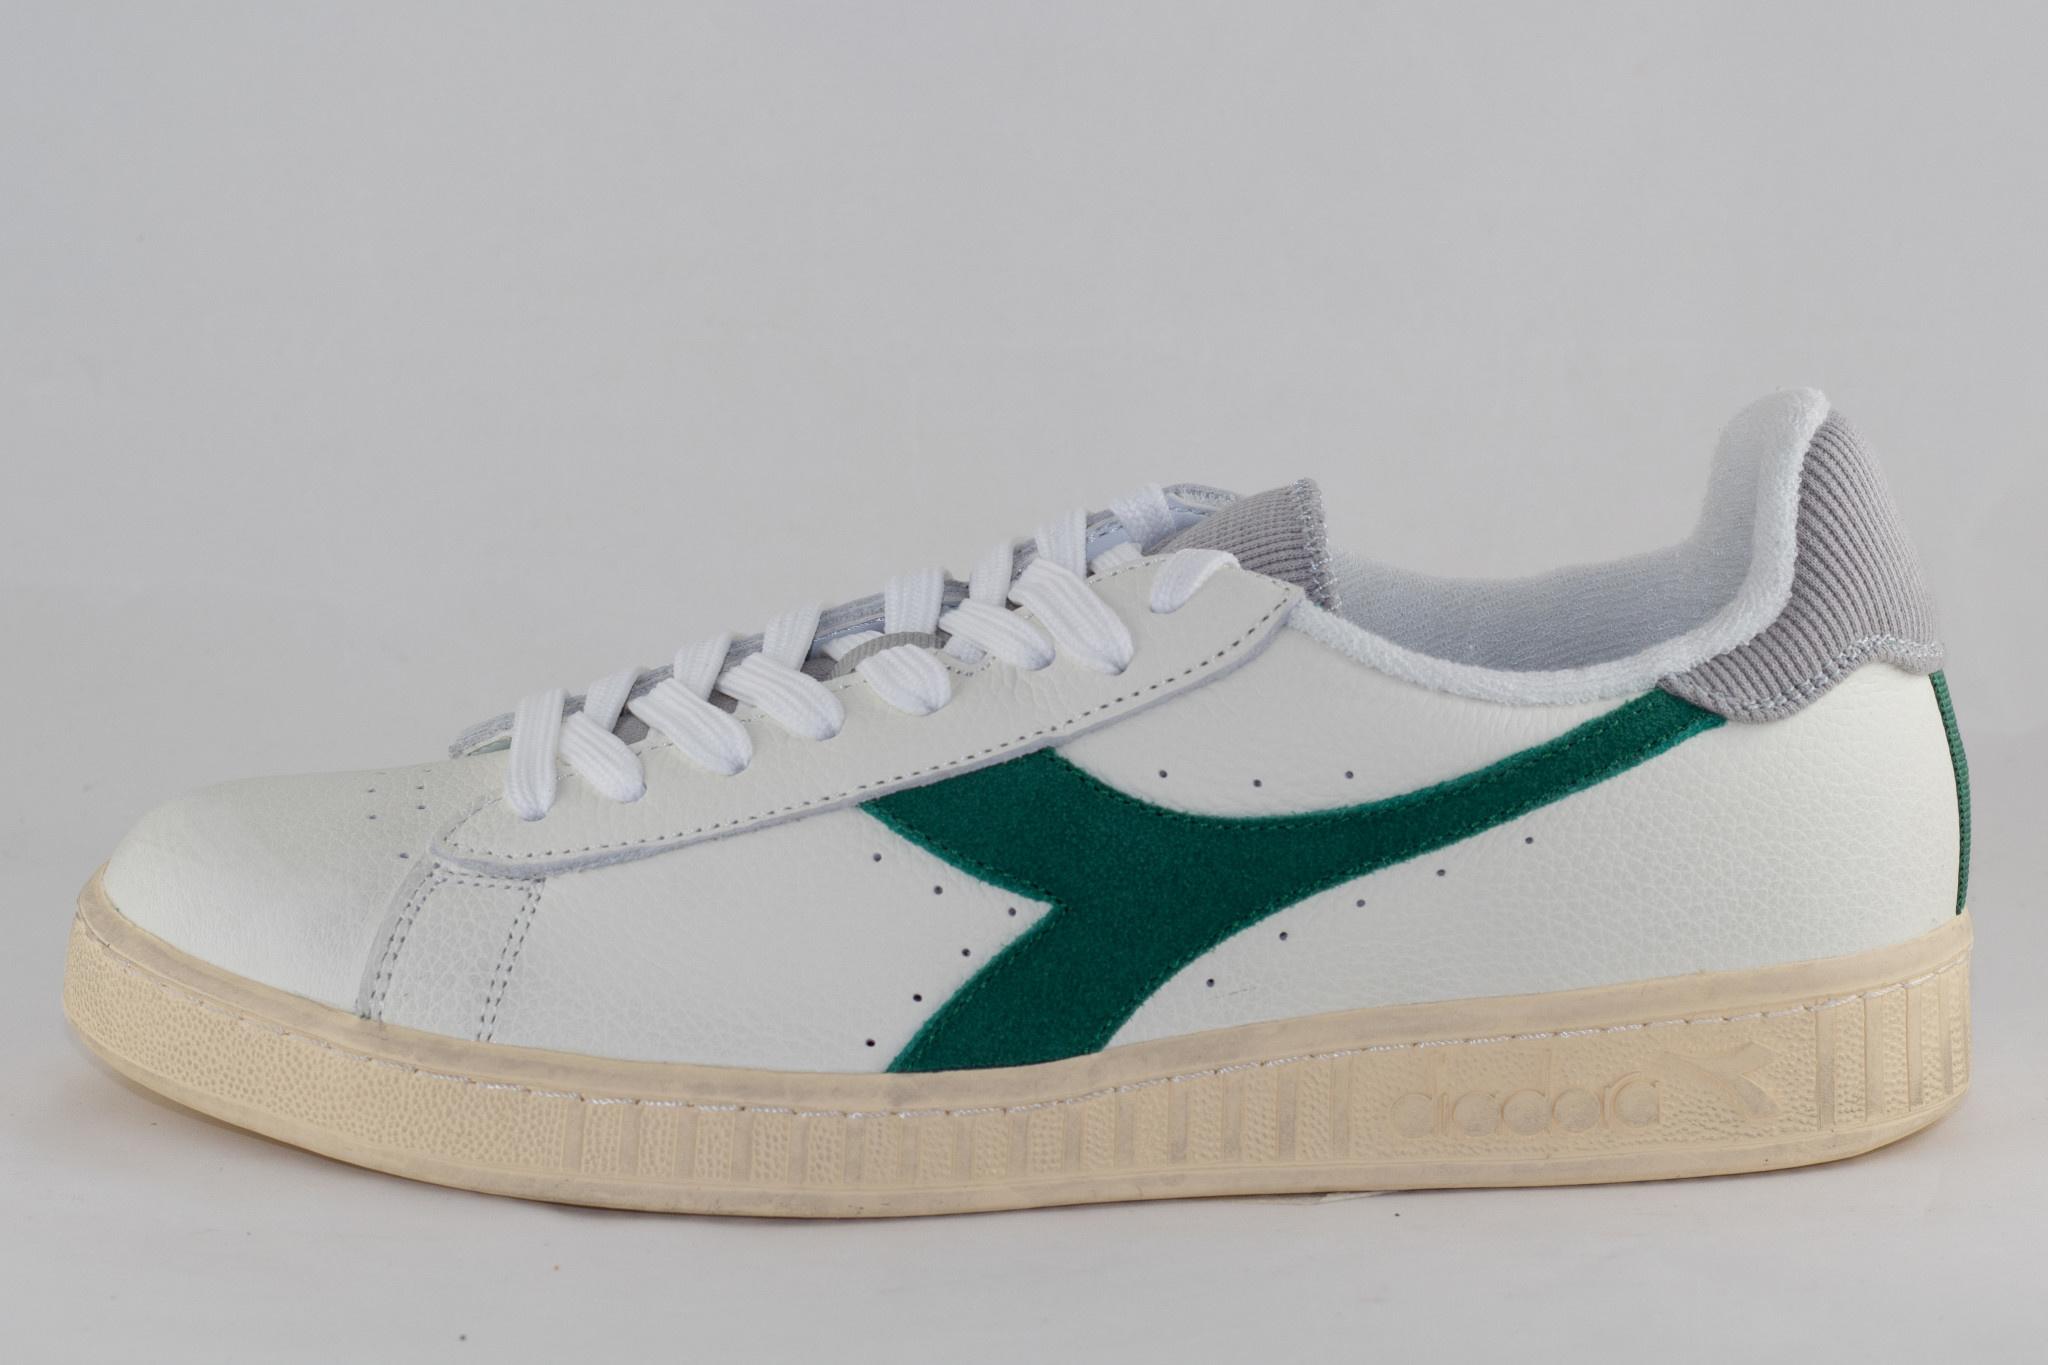 DIADORA GAME L LOW USED White/ Verdant Green